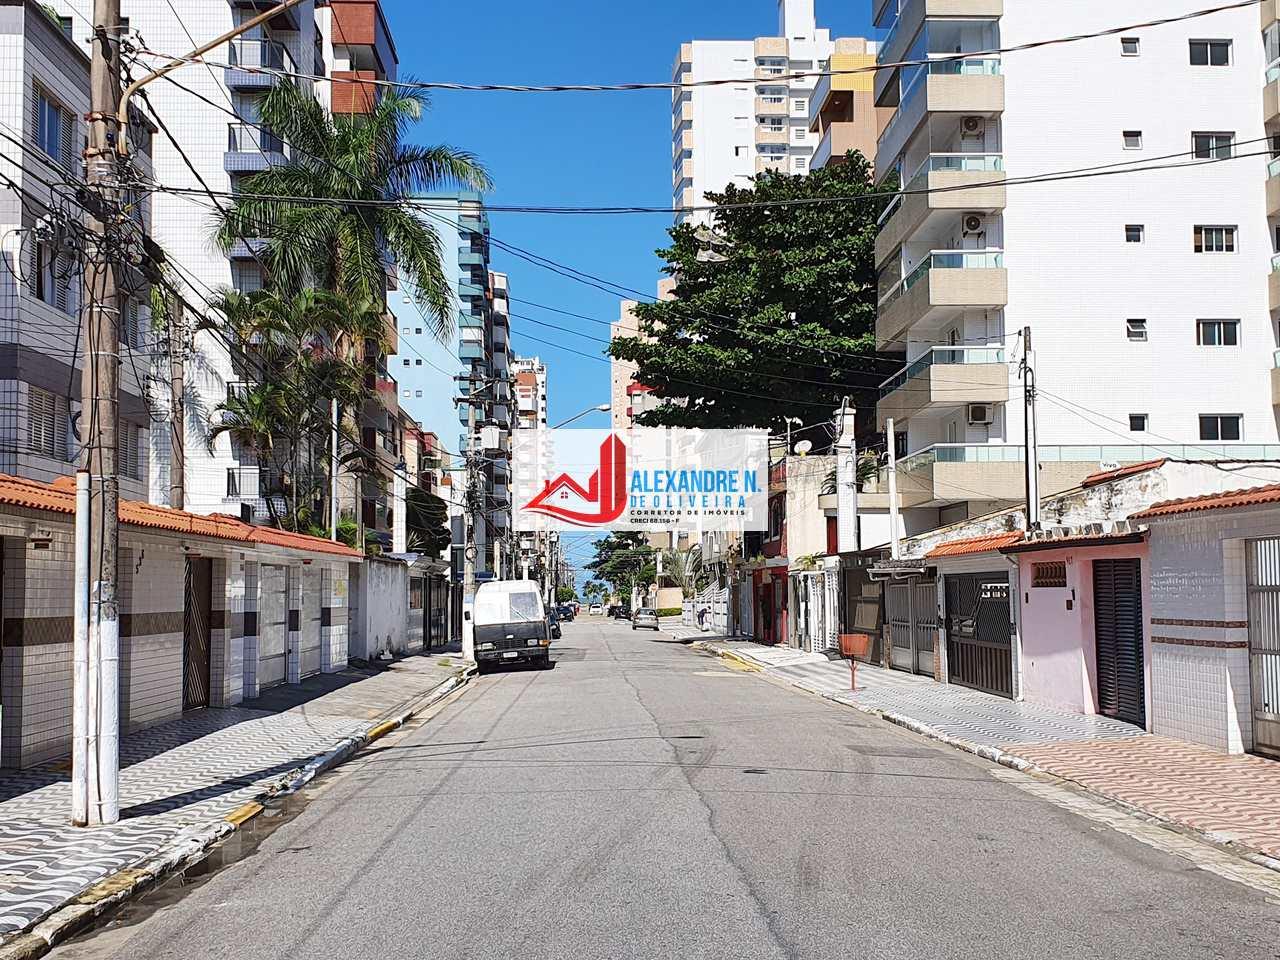 Apto 2 dorms, Guilhermina, Praia Grande, R$ 180 mil, AP00396